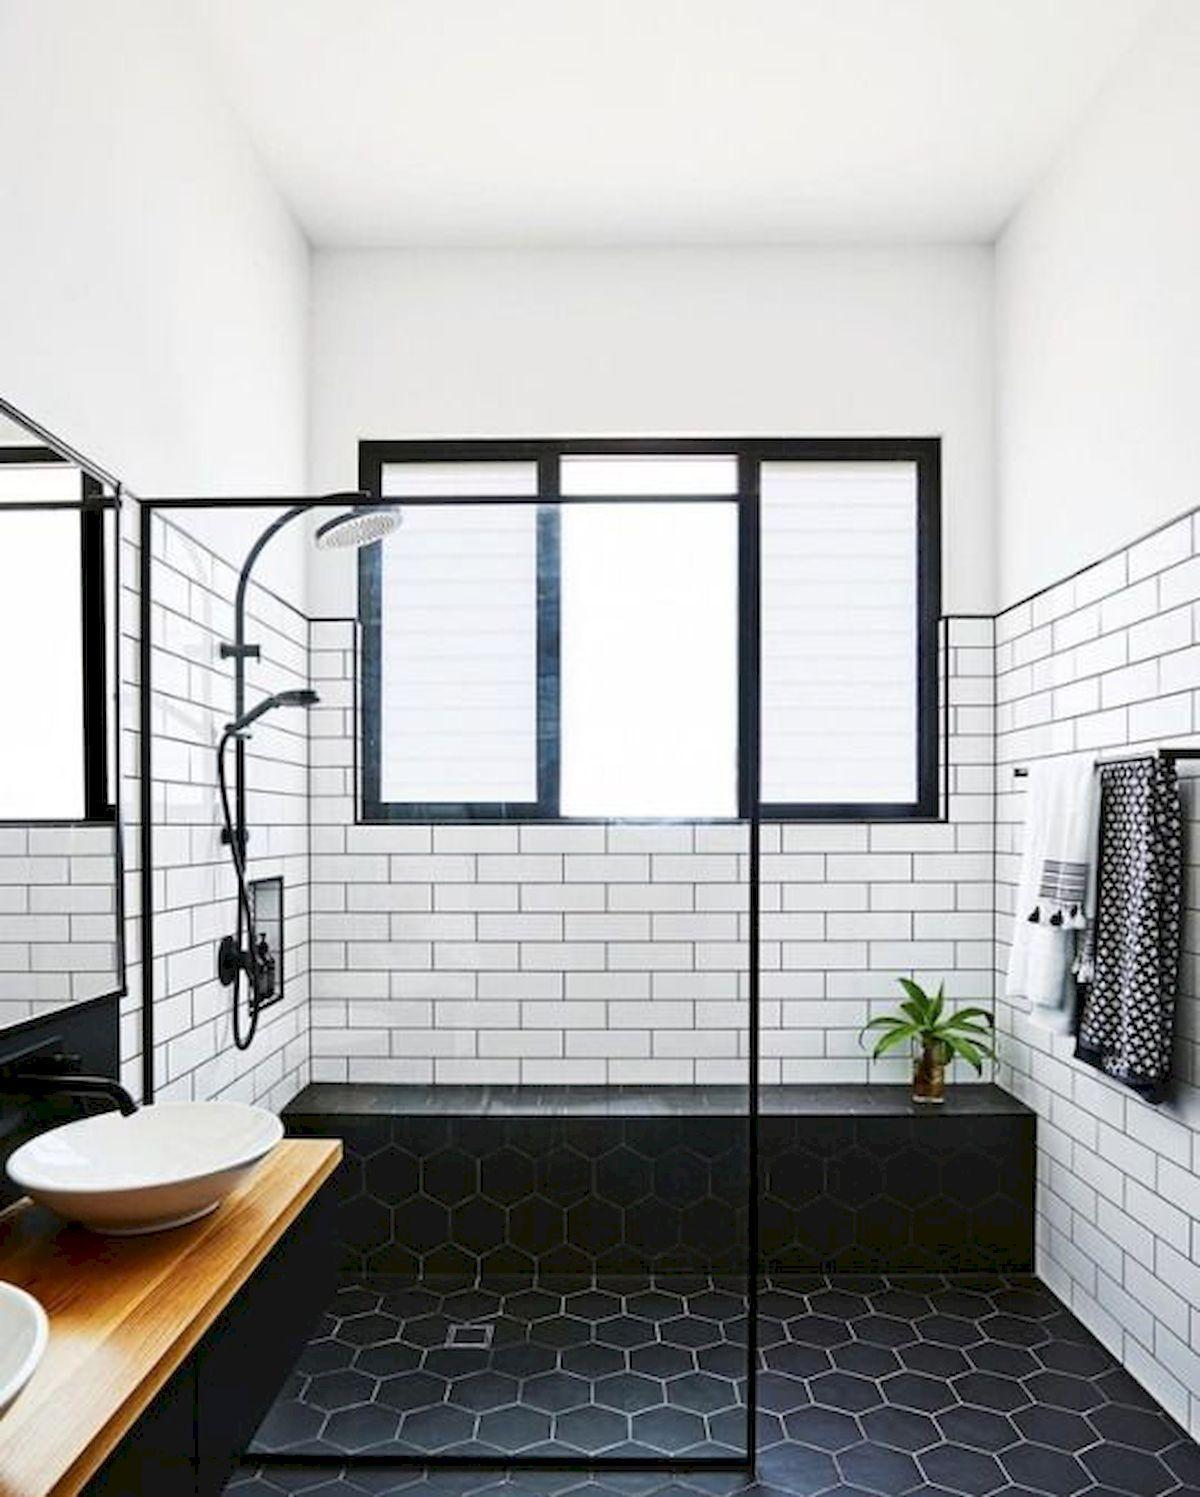 Elegant Bathroom Remodels: 60 Elegant Small Master Bathroom Remodel Ideas